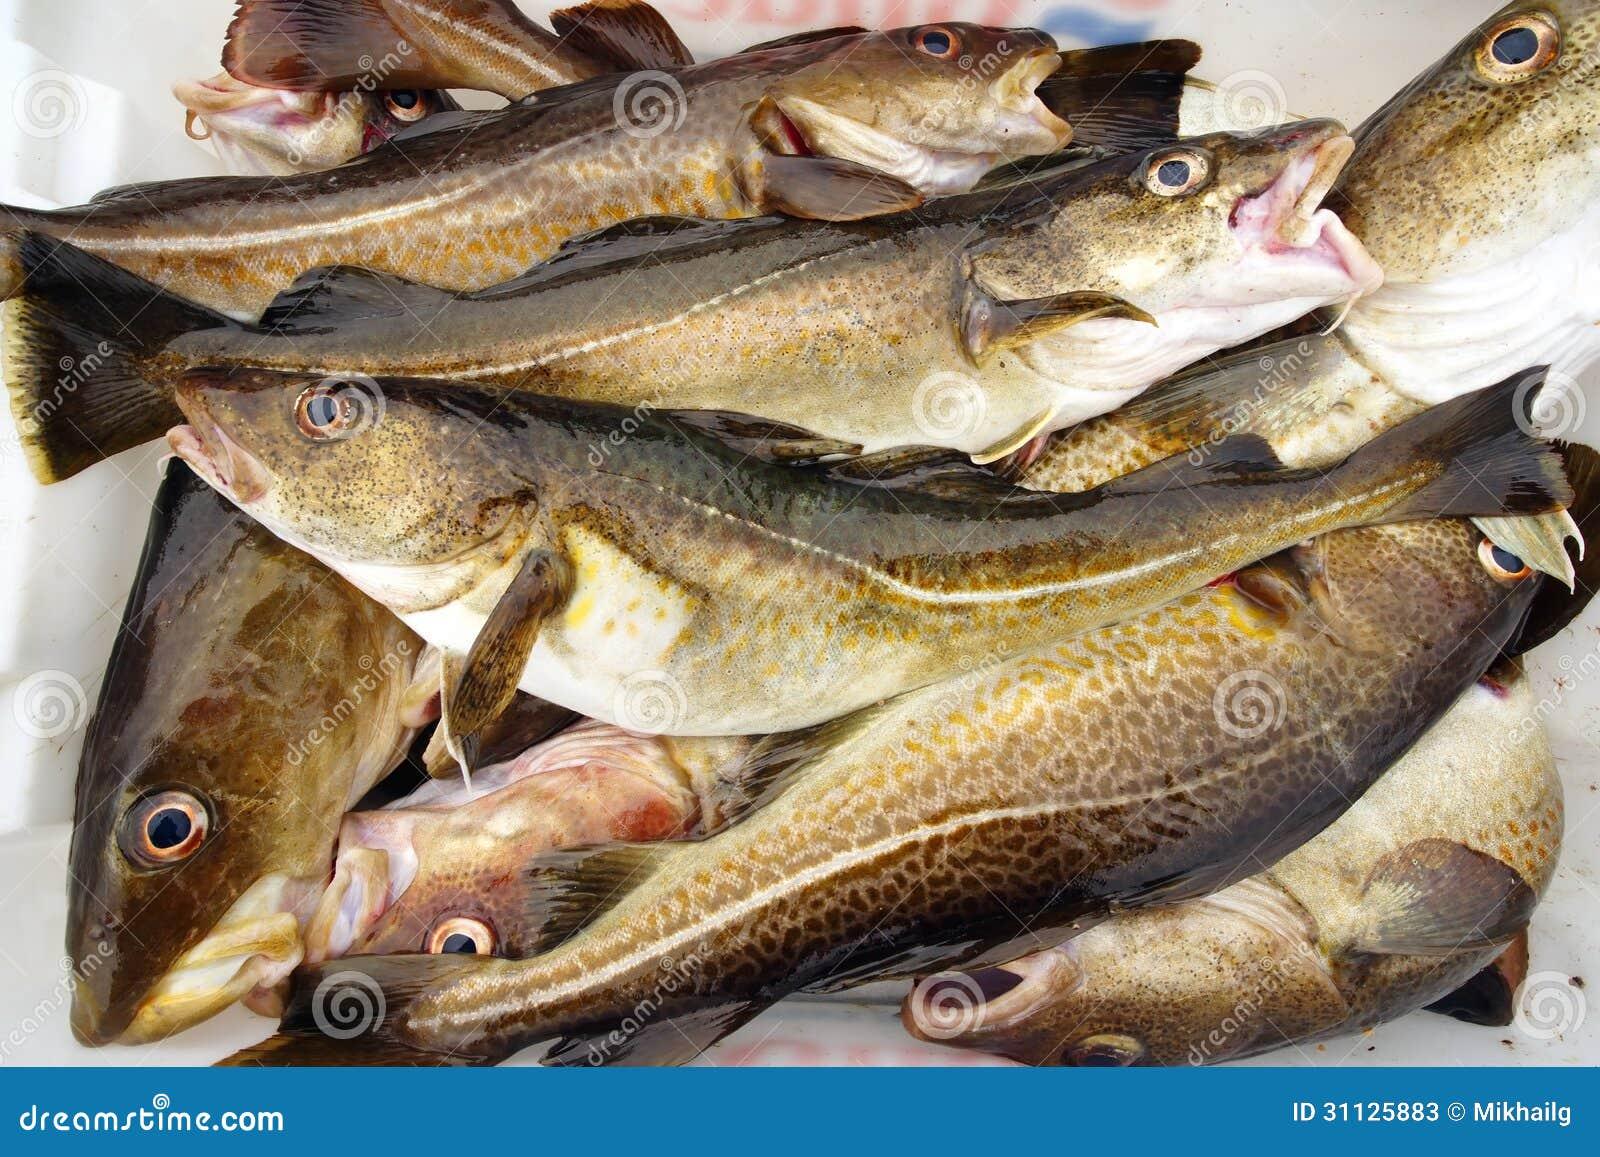 Pescados de bacalao imagen de archivo. Imagen de frescura - 31125883